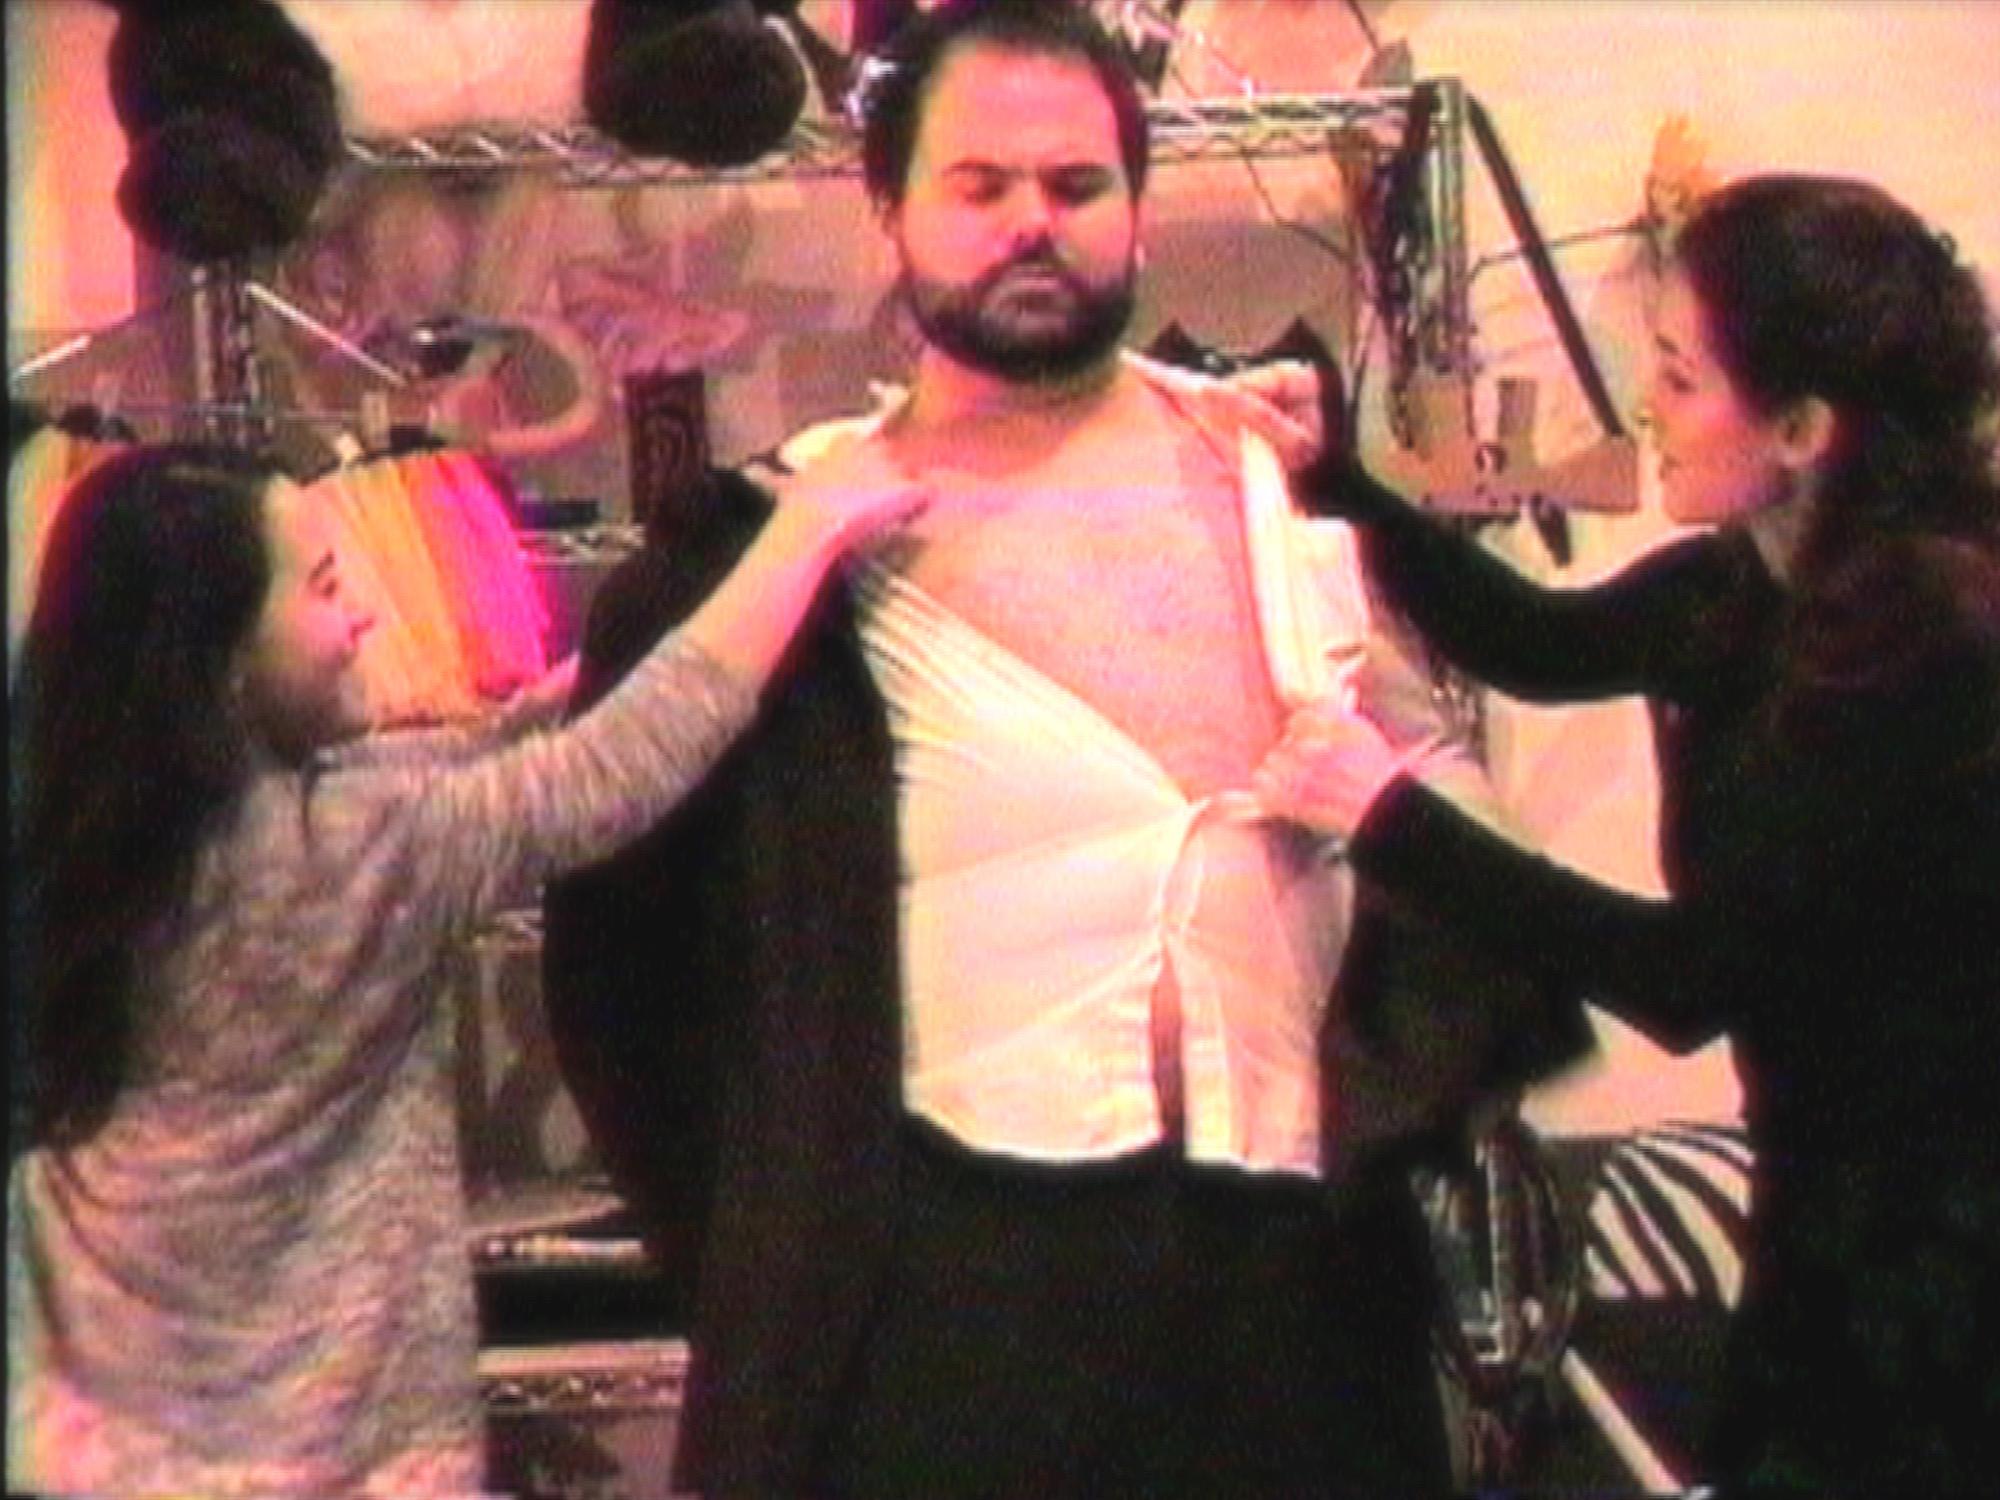 Geena Matuson  (@geenamatuson),  Maya Simone  and Dawn Nightshade directed by John Hartman of  Reel Groovy Films  on the set of his fake commercial shoot, 2016.